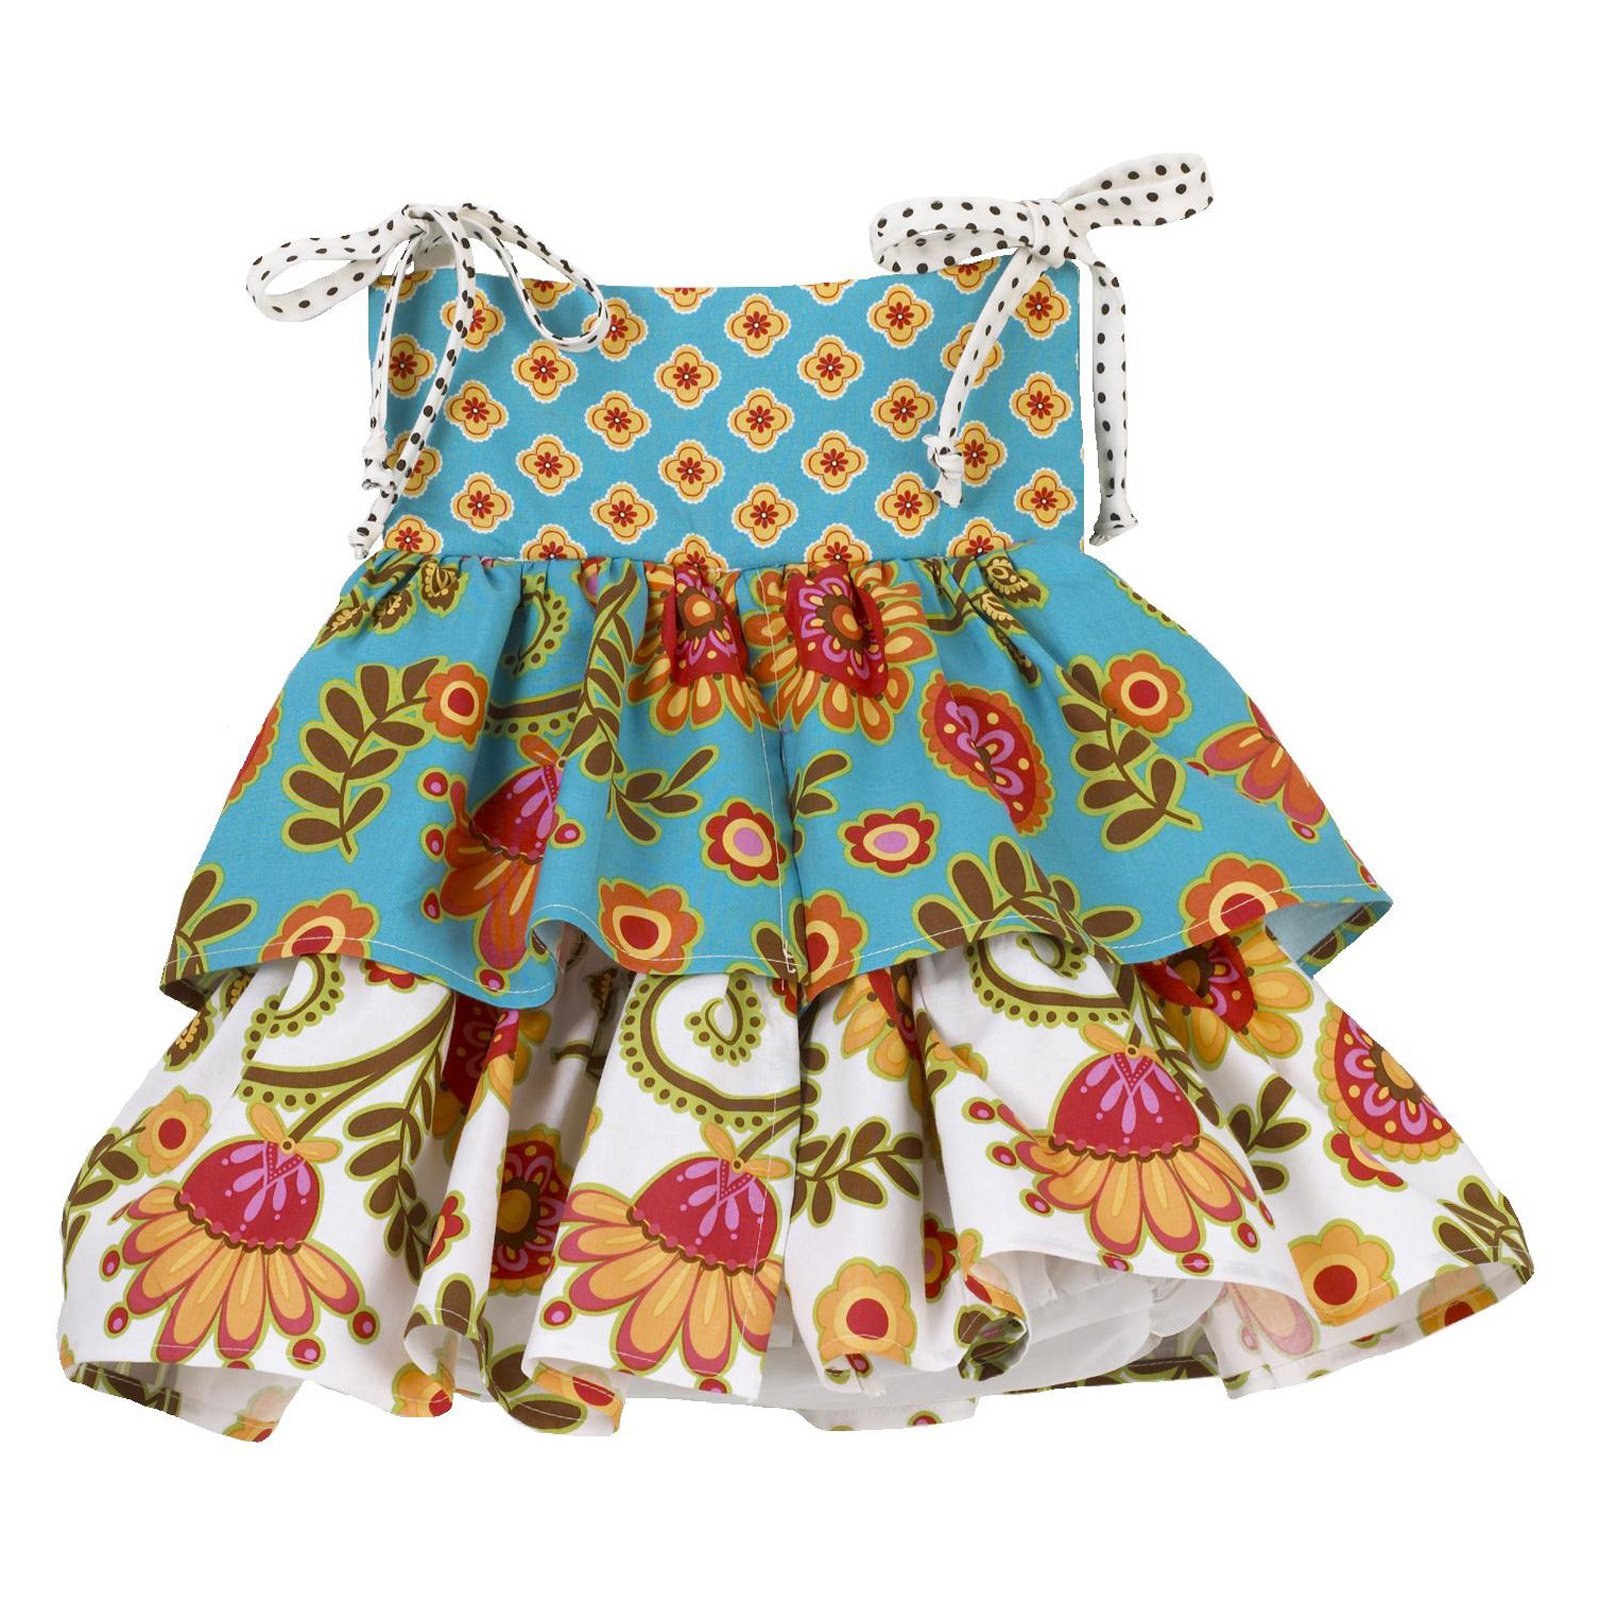 Cotton Tale Designs Gypsy Diaper Stacker by Cotton Tale Designs